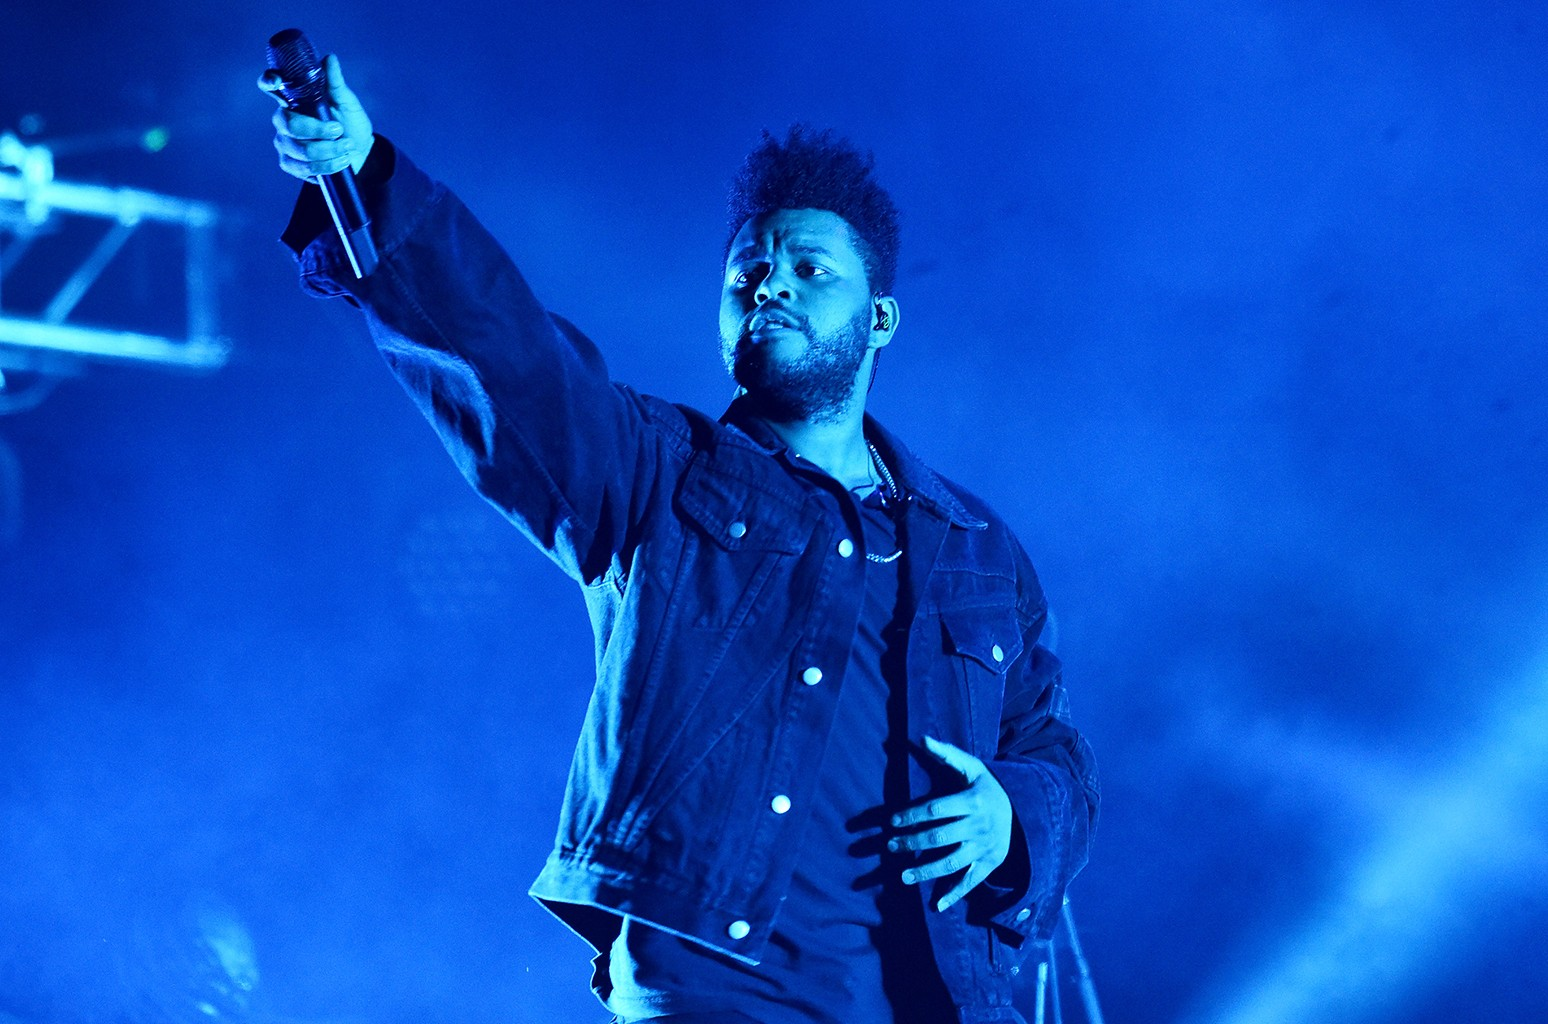 The Weeknd Fans Celebrate Super Bowl Halftime Gig: 'That's a Big W' - Billboard